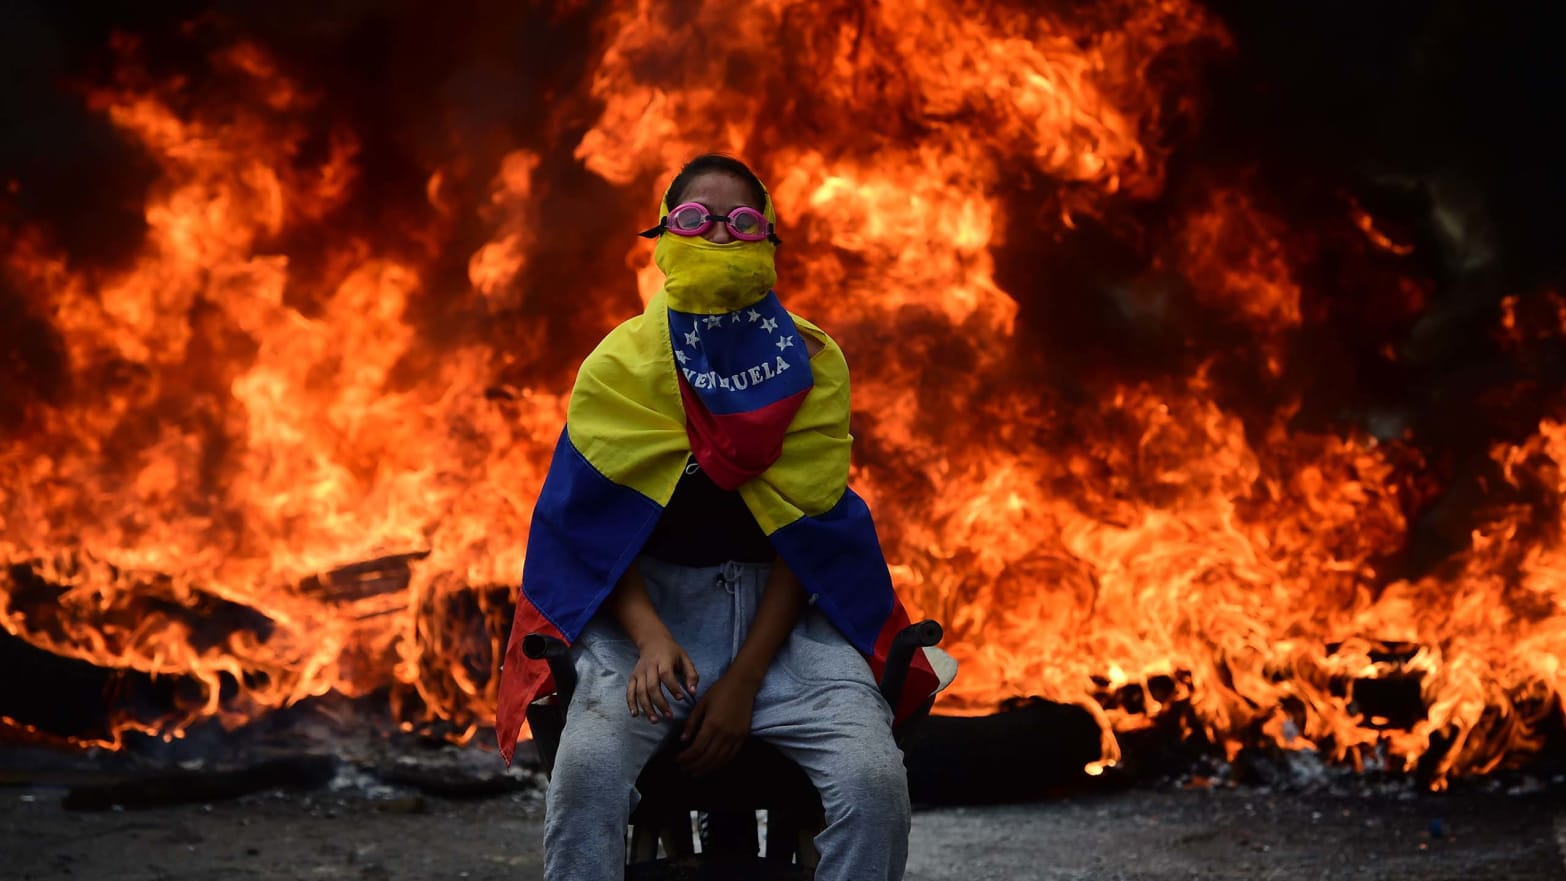 Rumors of War With the U.S. Run Rampant in Venezuela